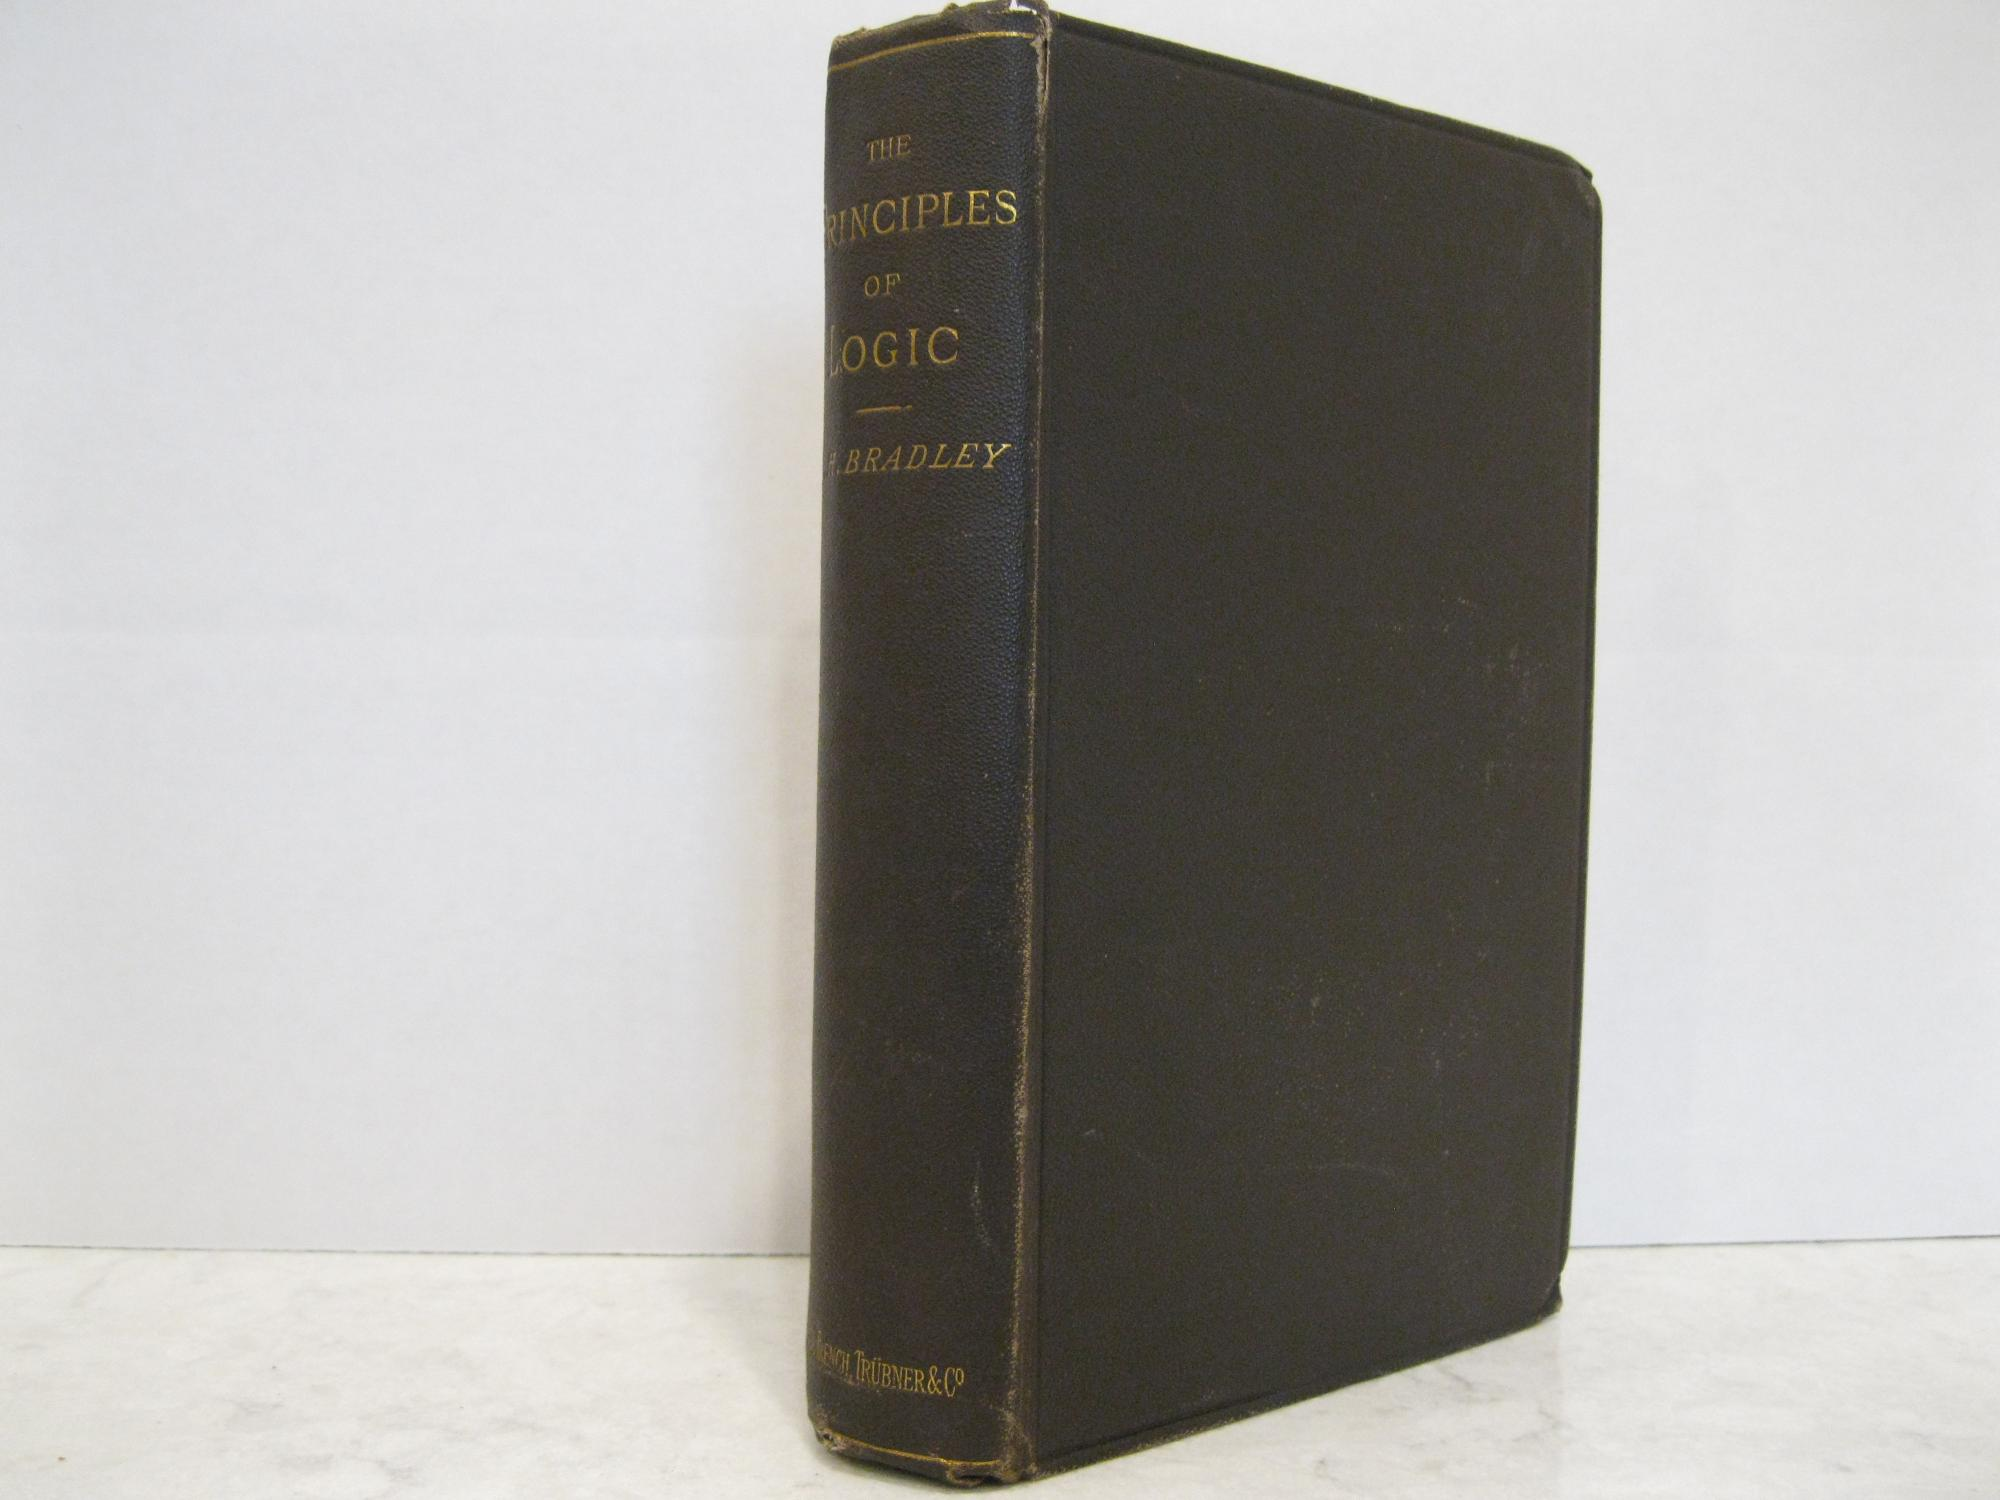 THE_PRINCIPLES_OF_LOGIC_BRADLEY_FH_Very_Good_Hardcover